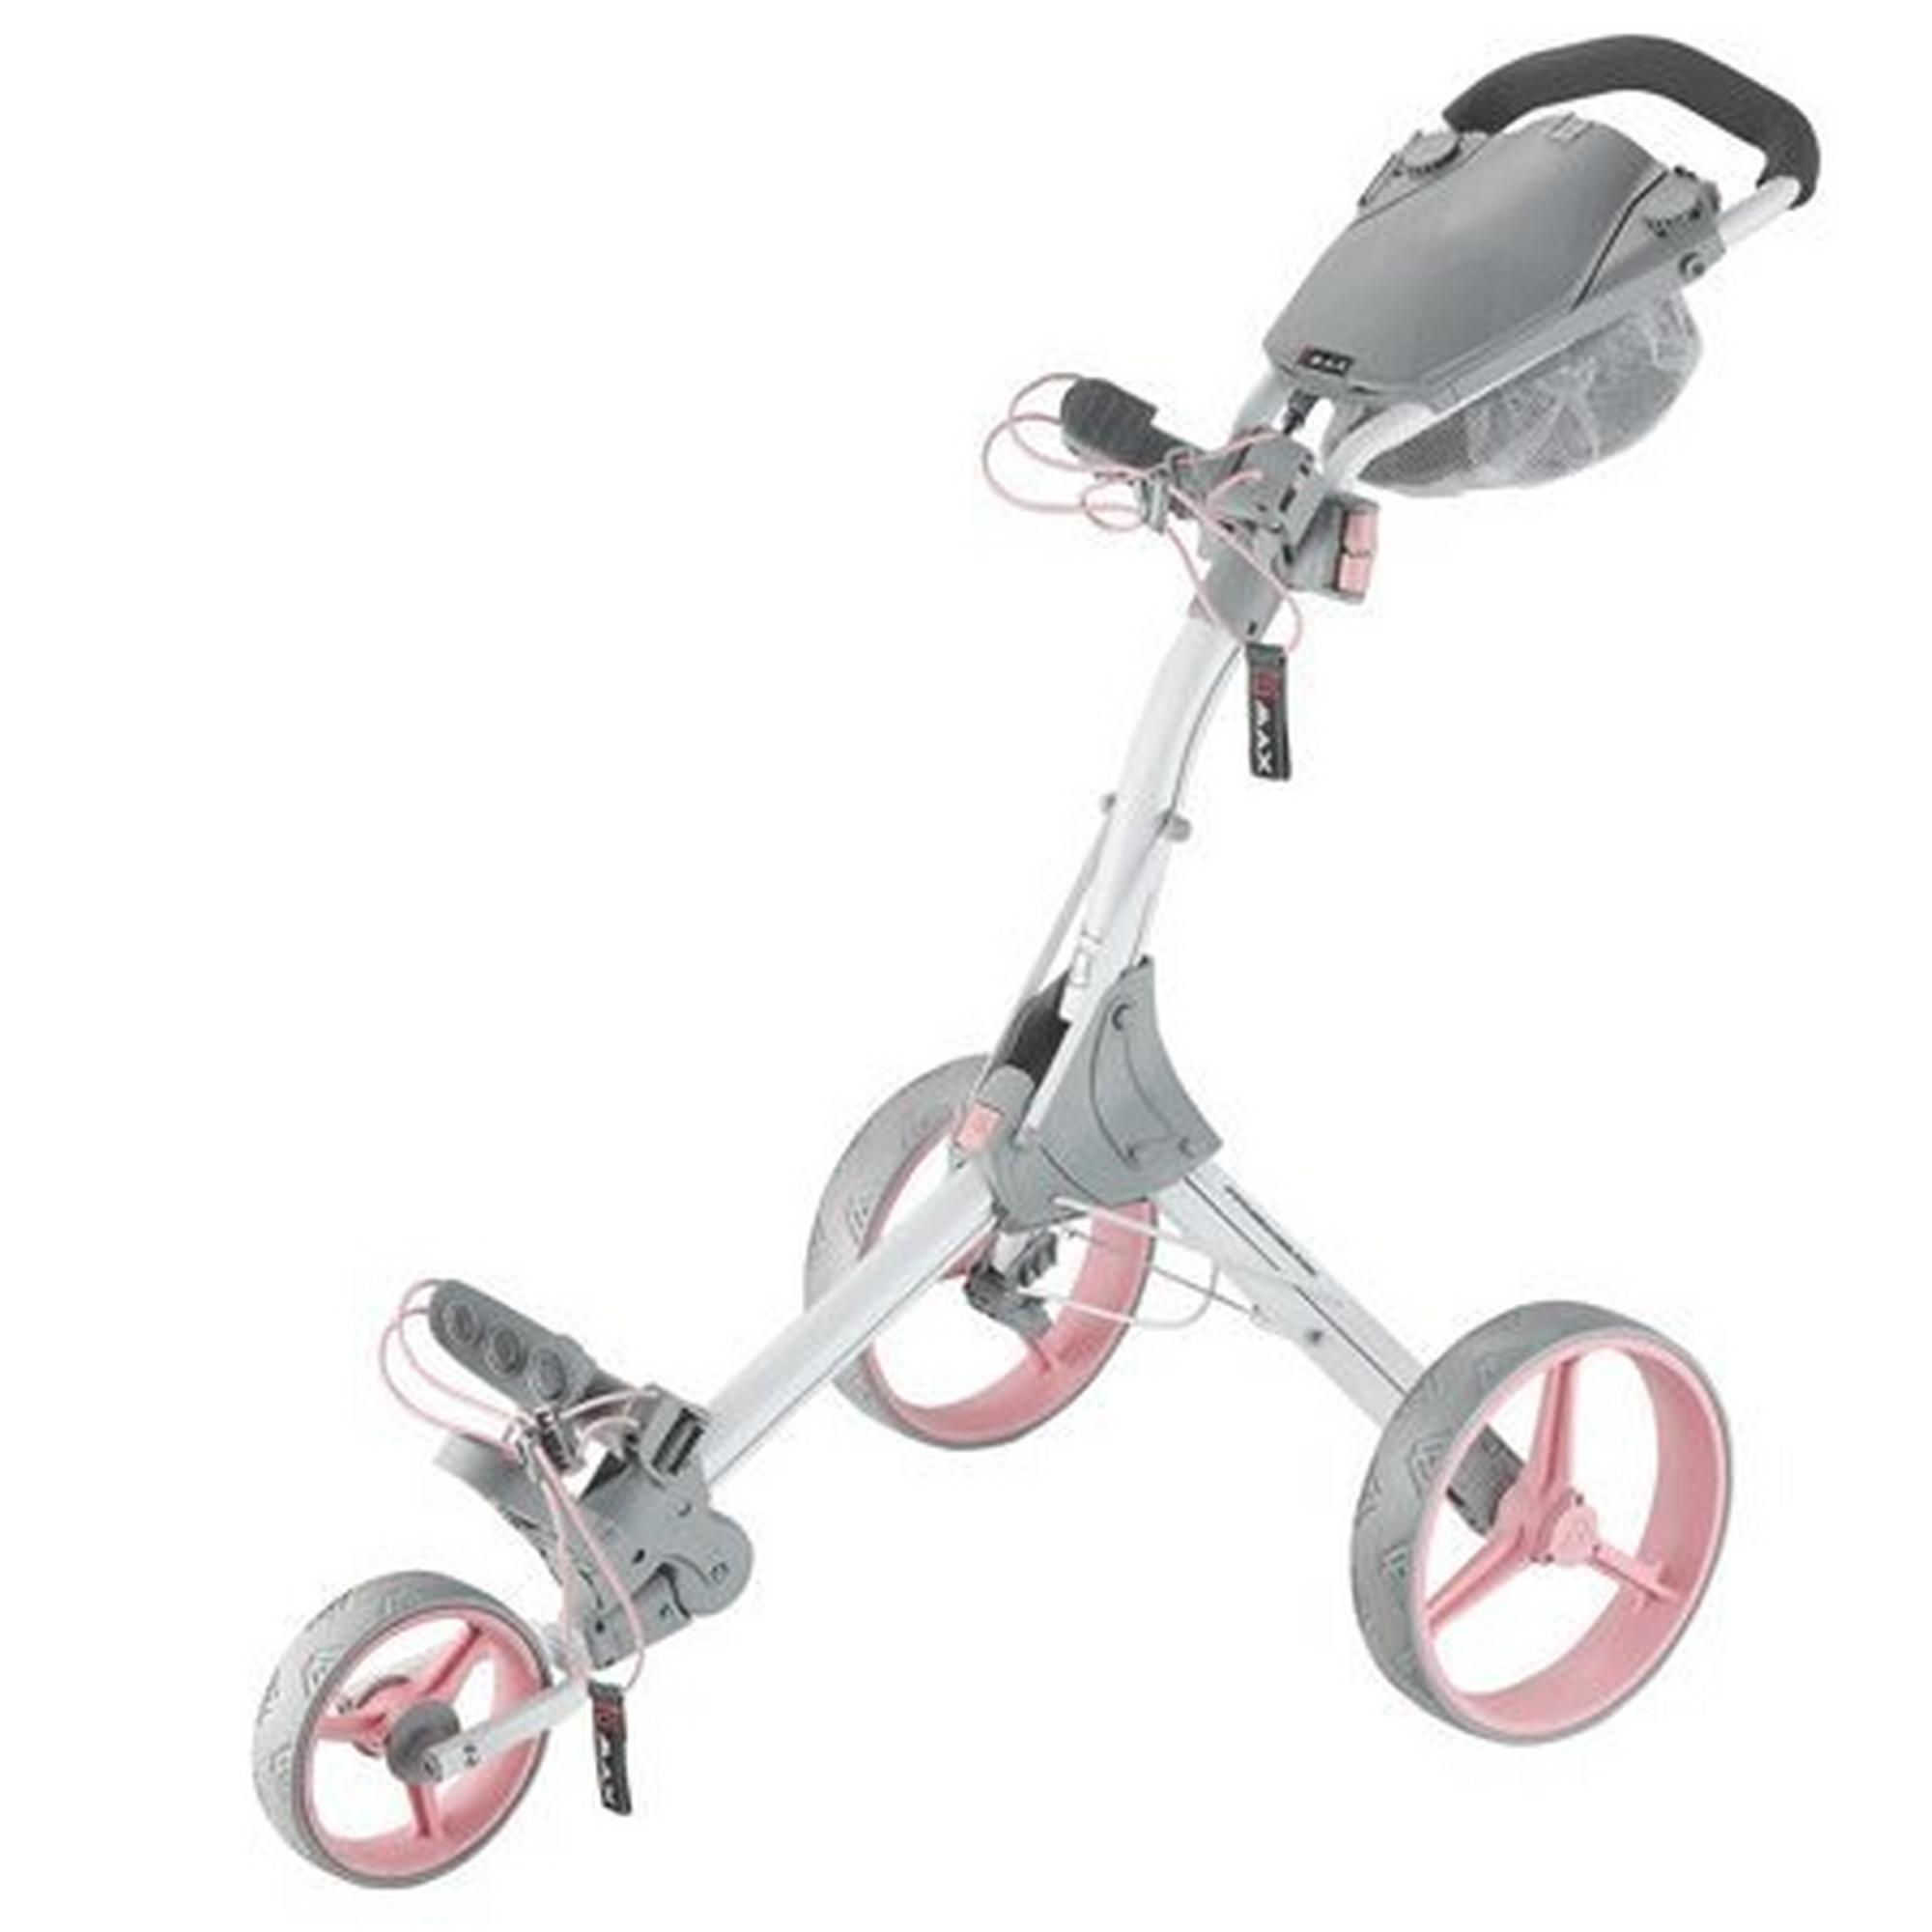 IQ Plus 3-Wheel Push Cart